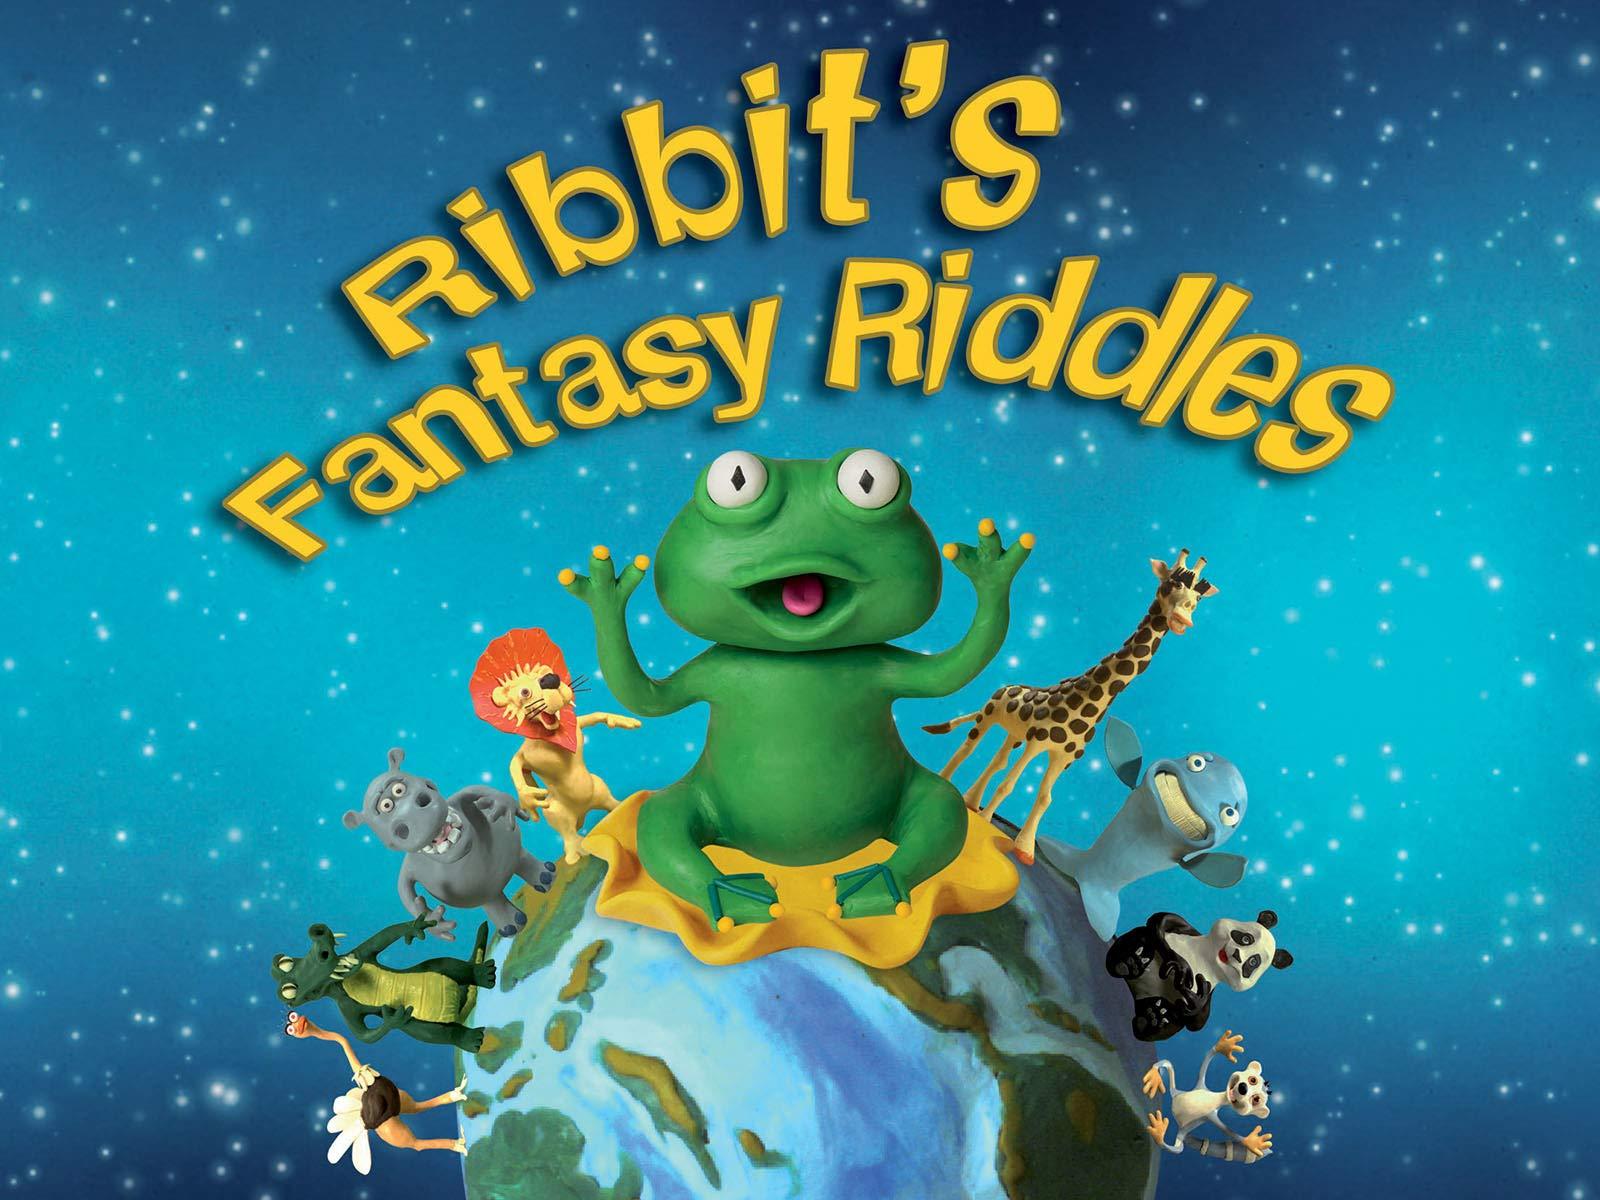 Ribbit's Fantasy Riddles on Amazon Prime Video UK